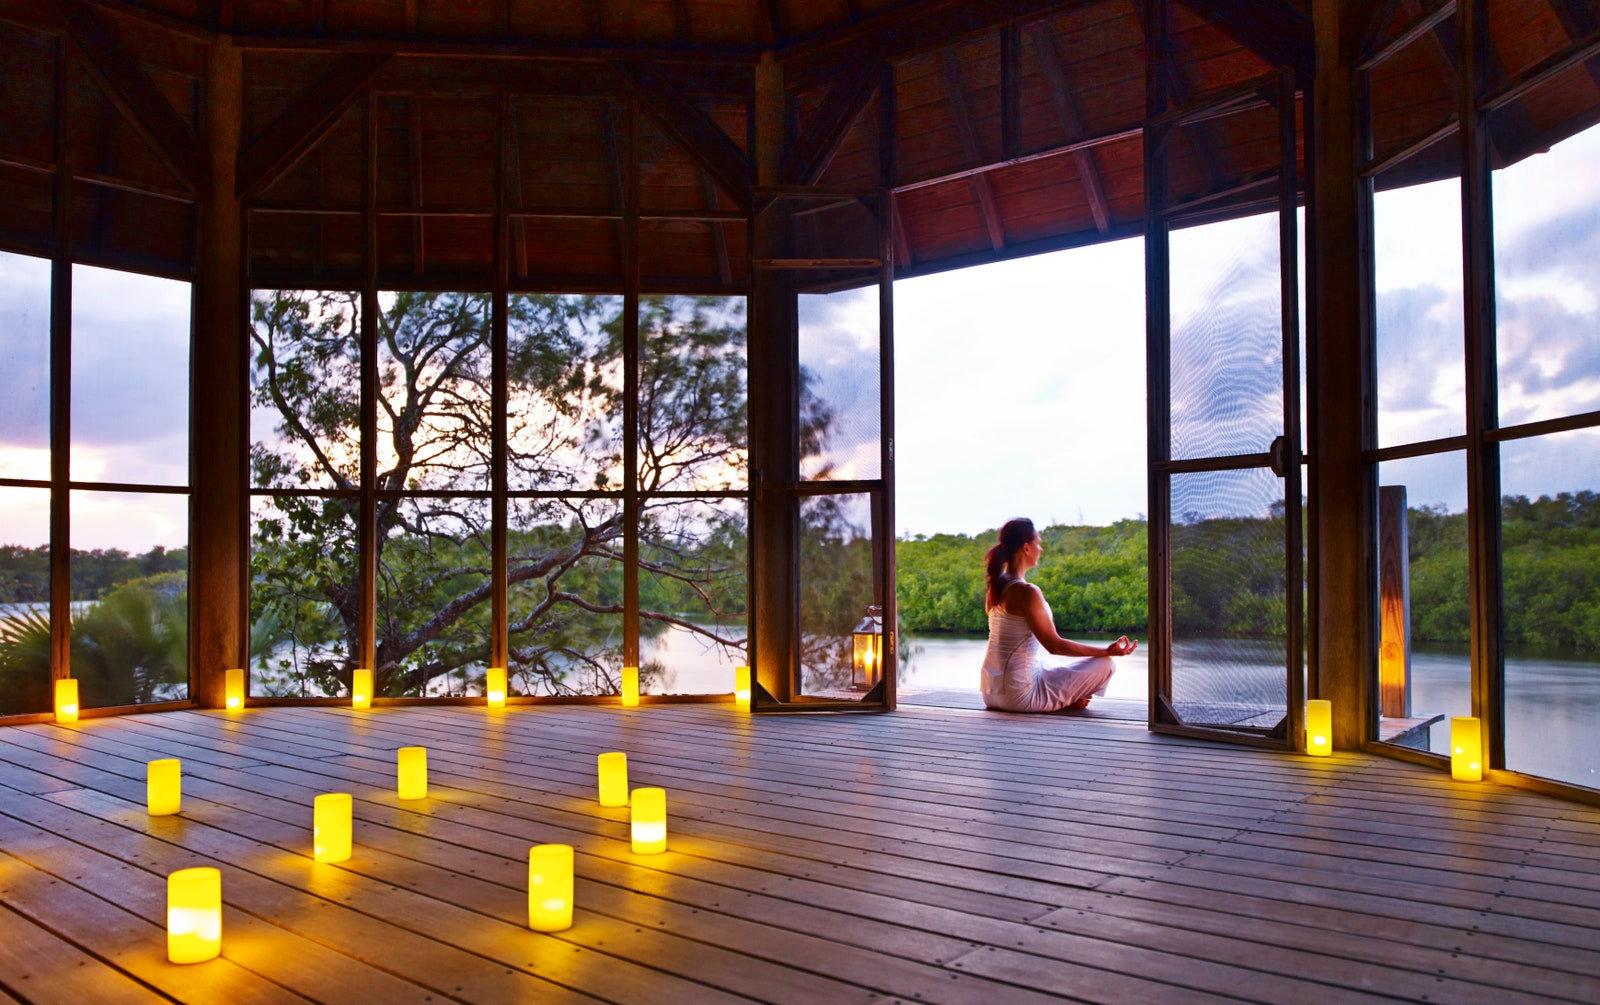 Group Healing Meditations